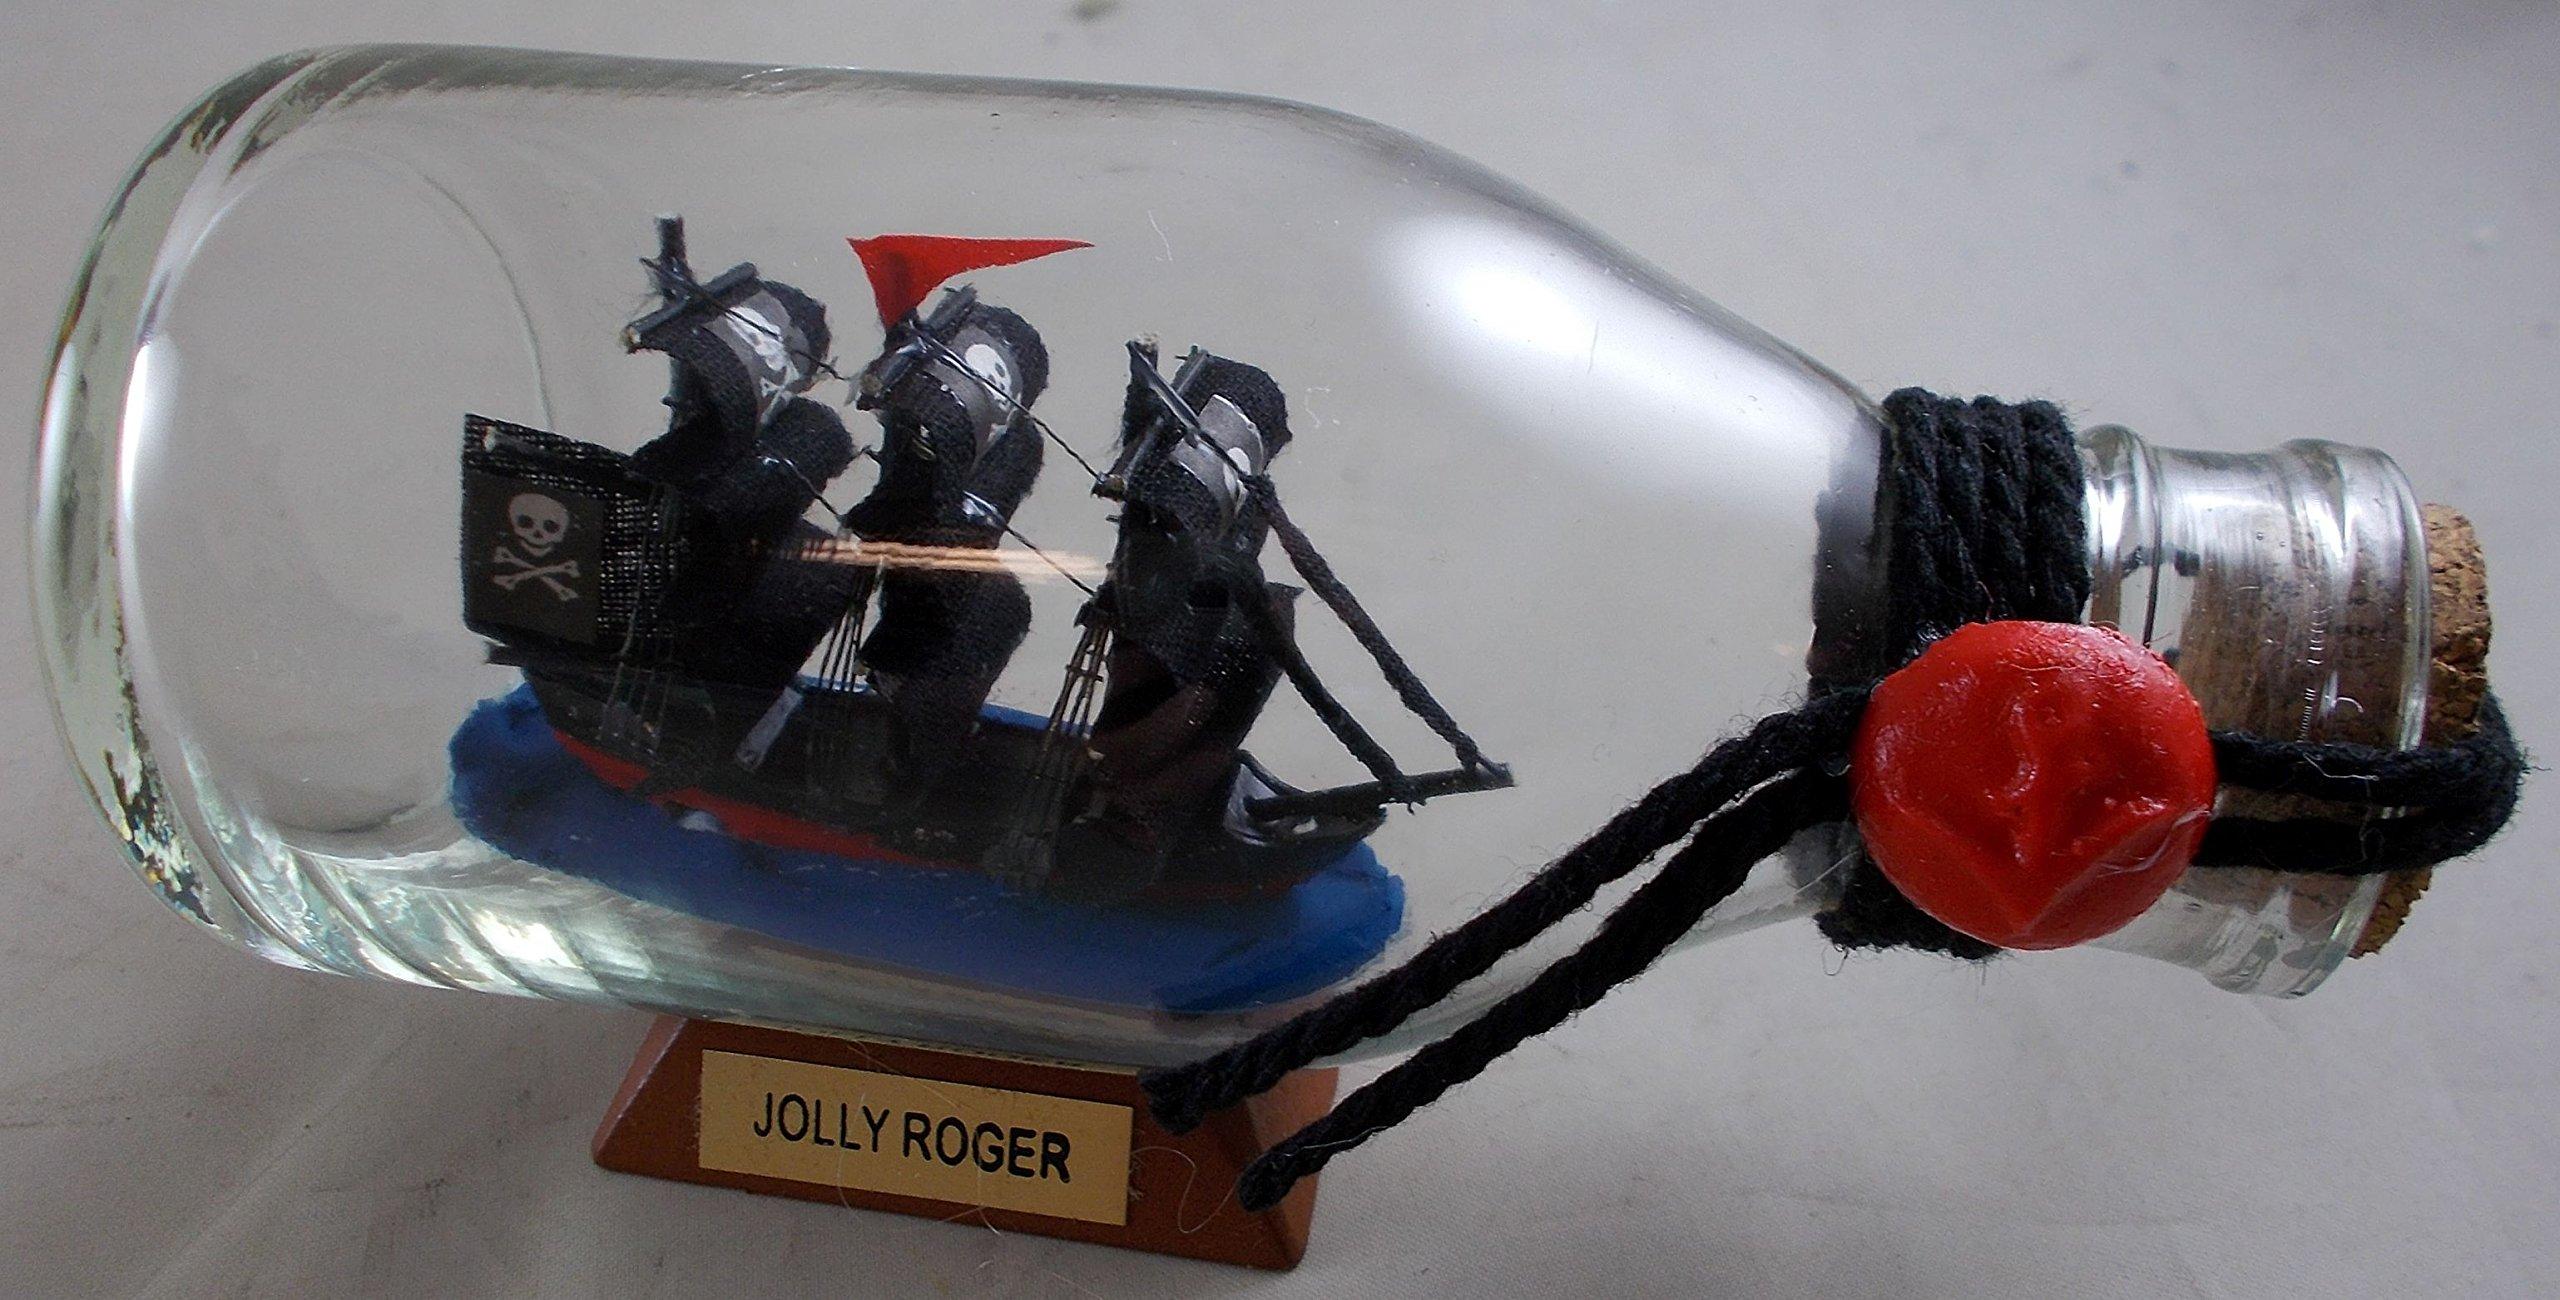 Pirate Ship JOLLY ROGER Ship in A Bottle Model